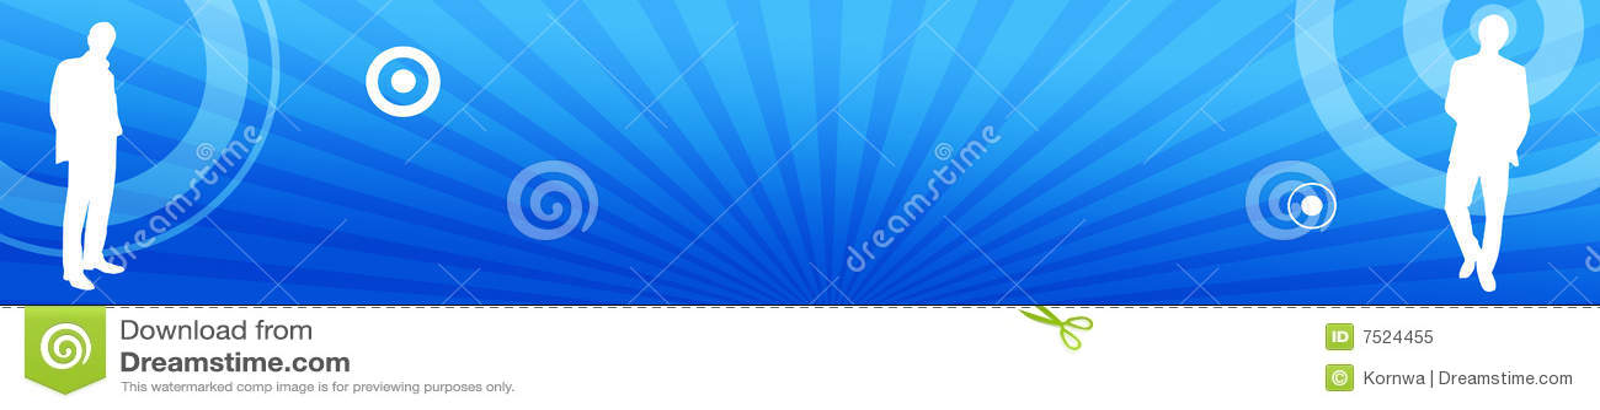 Vorsatz - Fahne